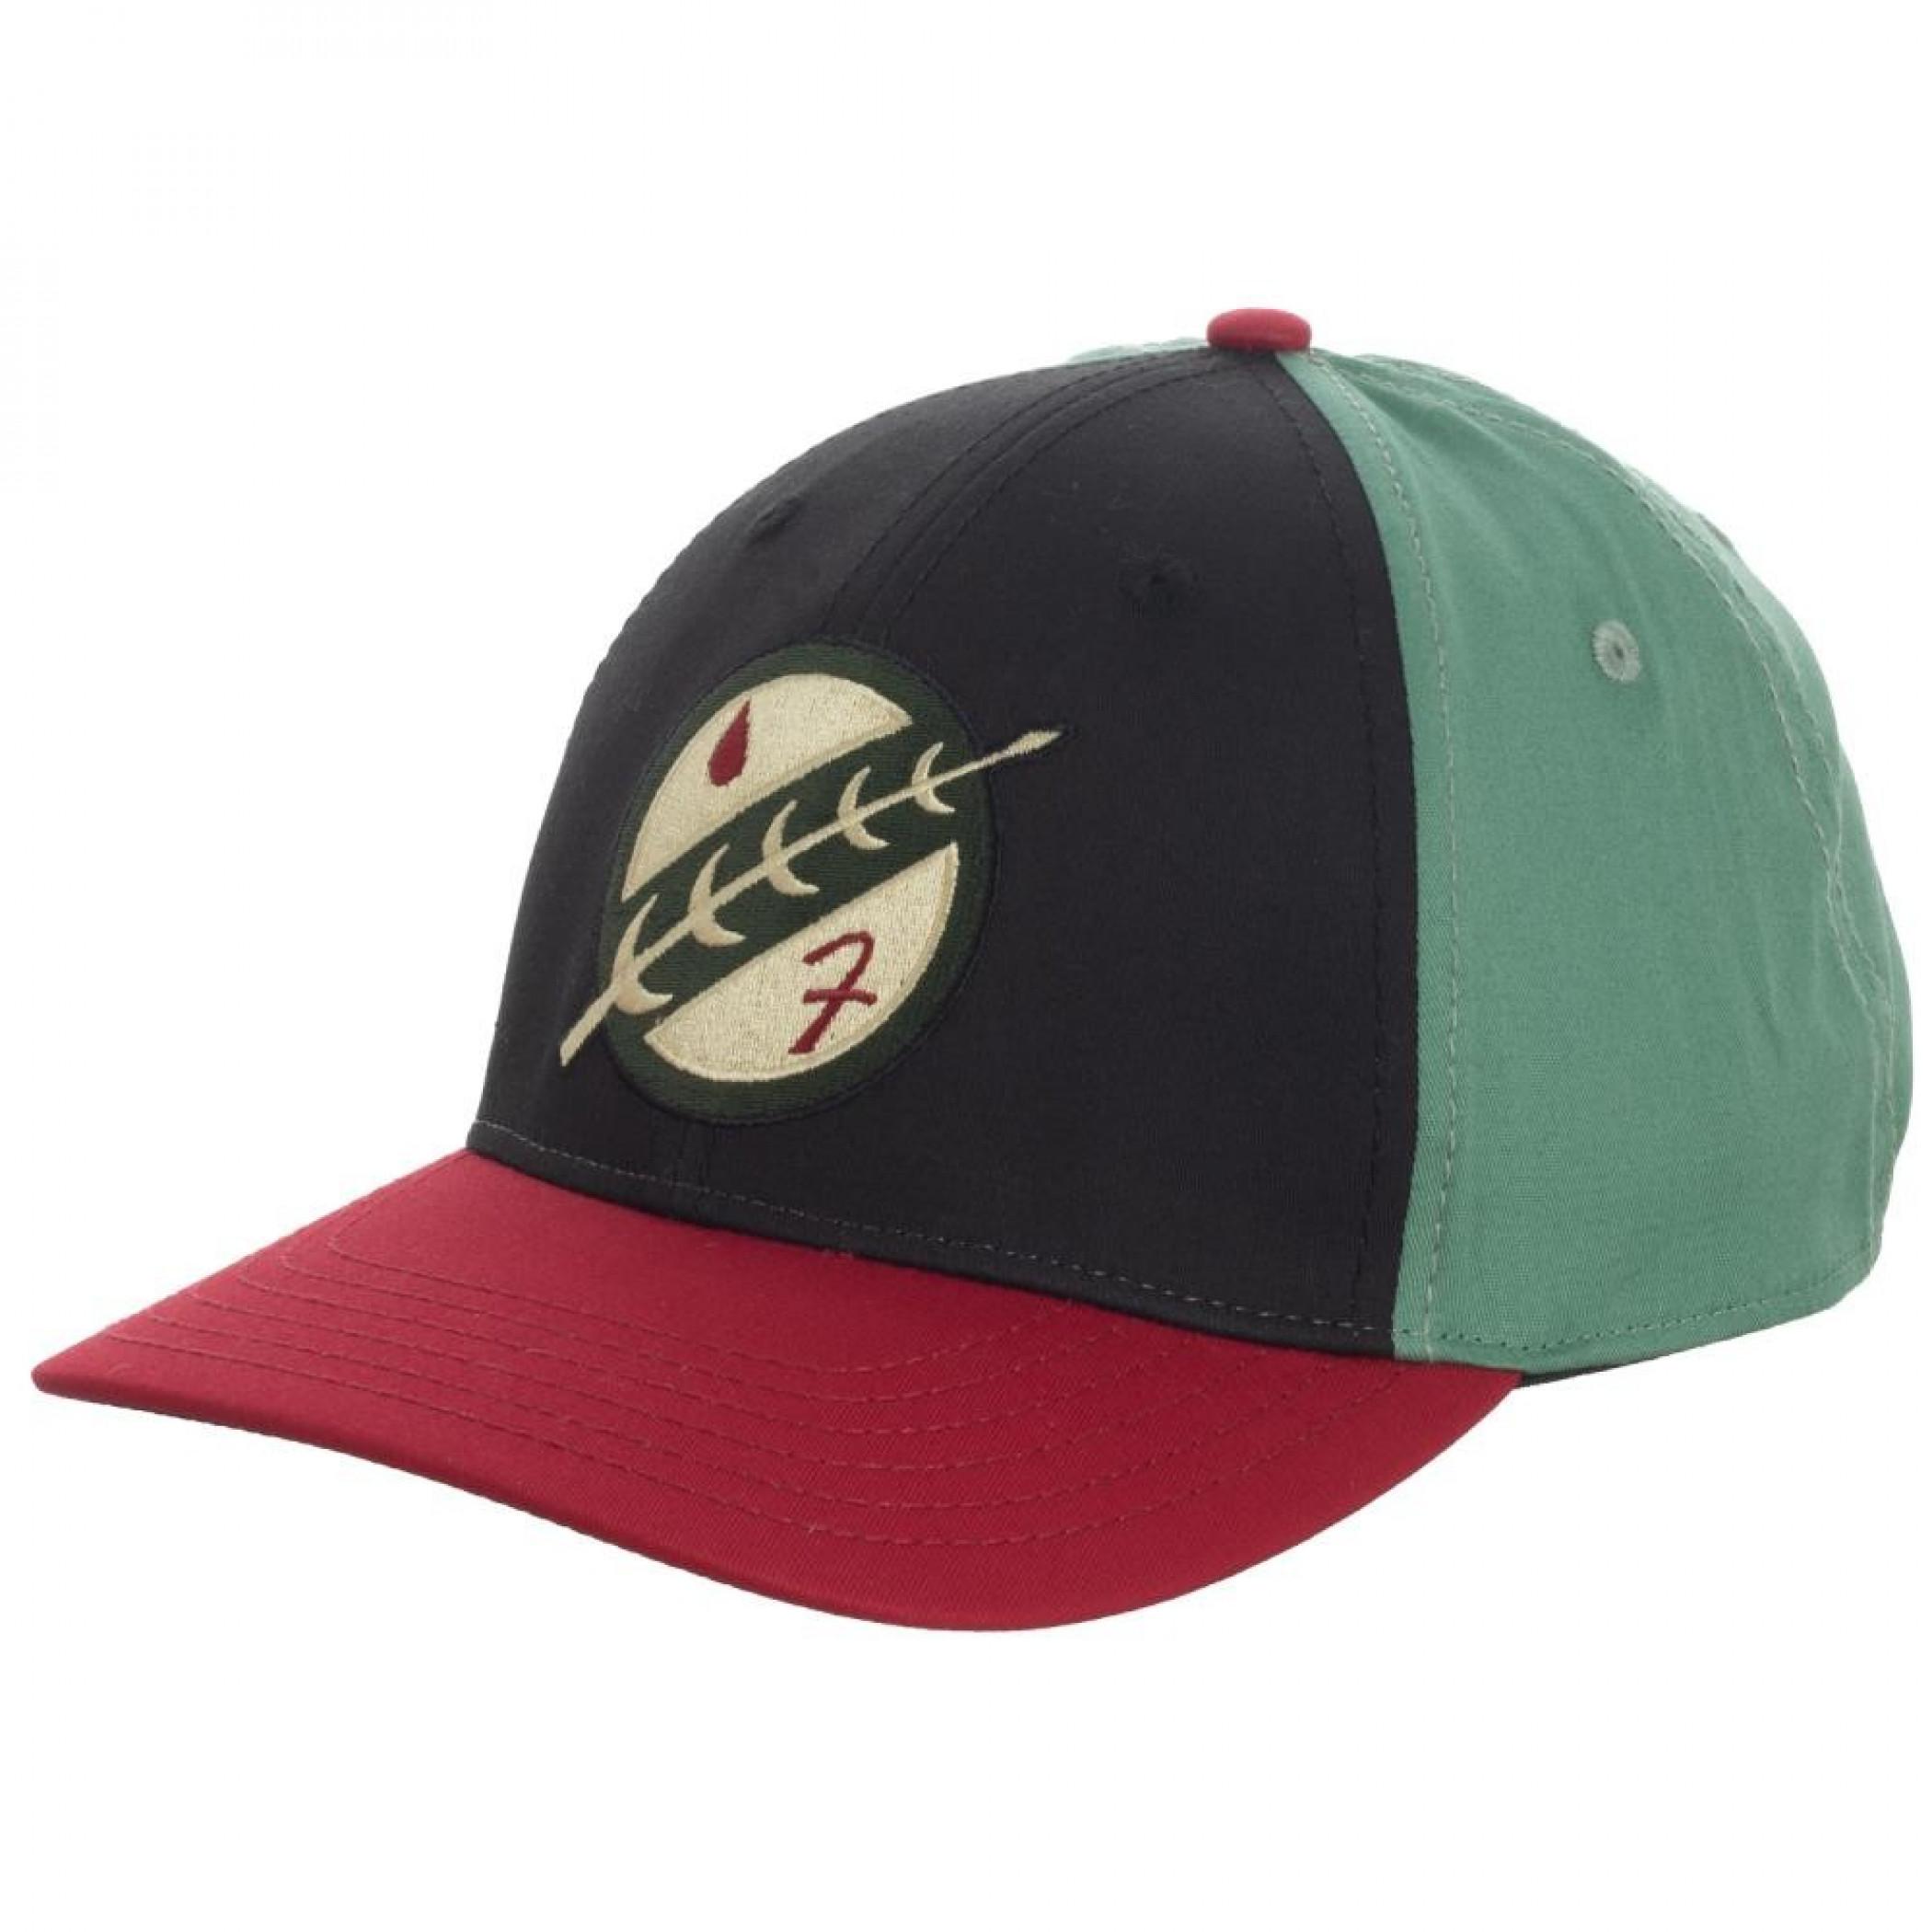 Boba Fett Embroidered Flex Fit Hat